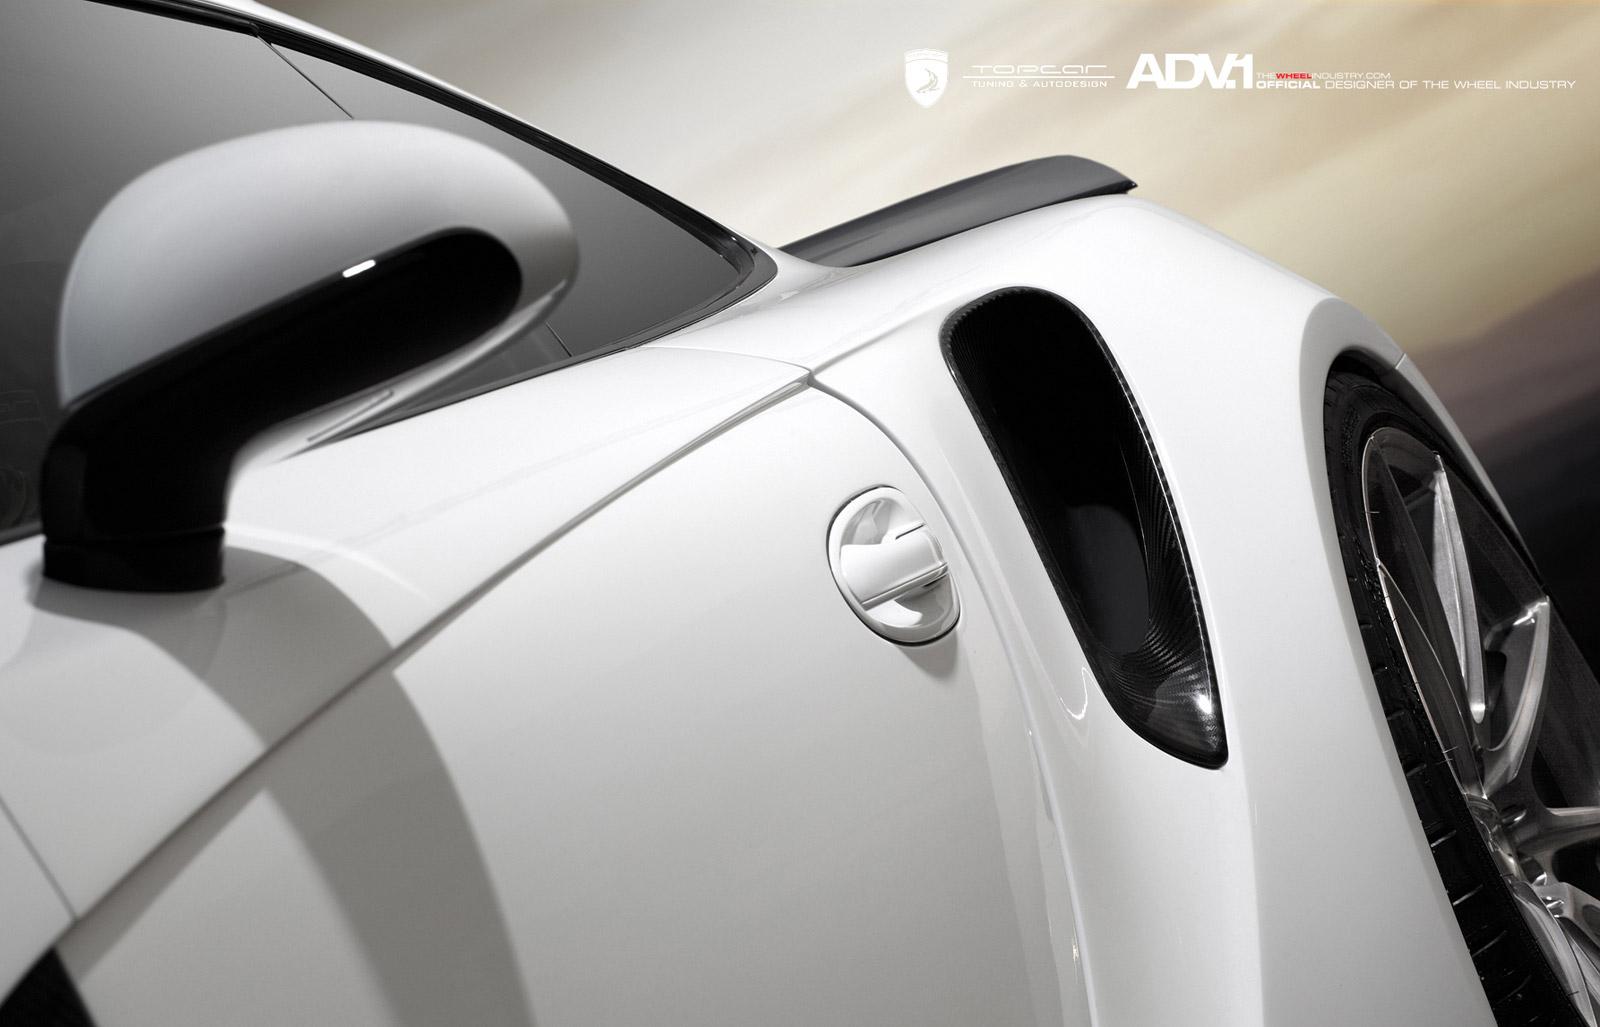 porsche-911-turbo-typ-991-topcar-stinger-gtr-006